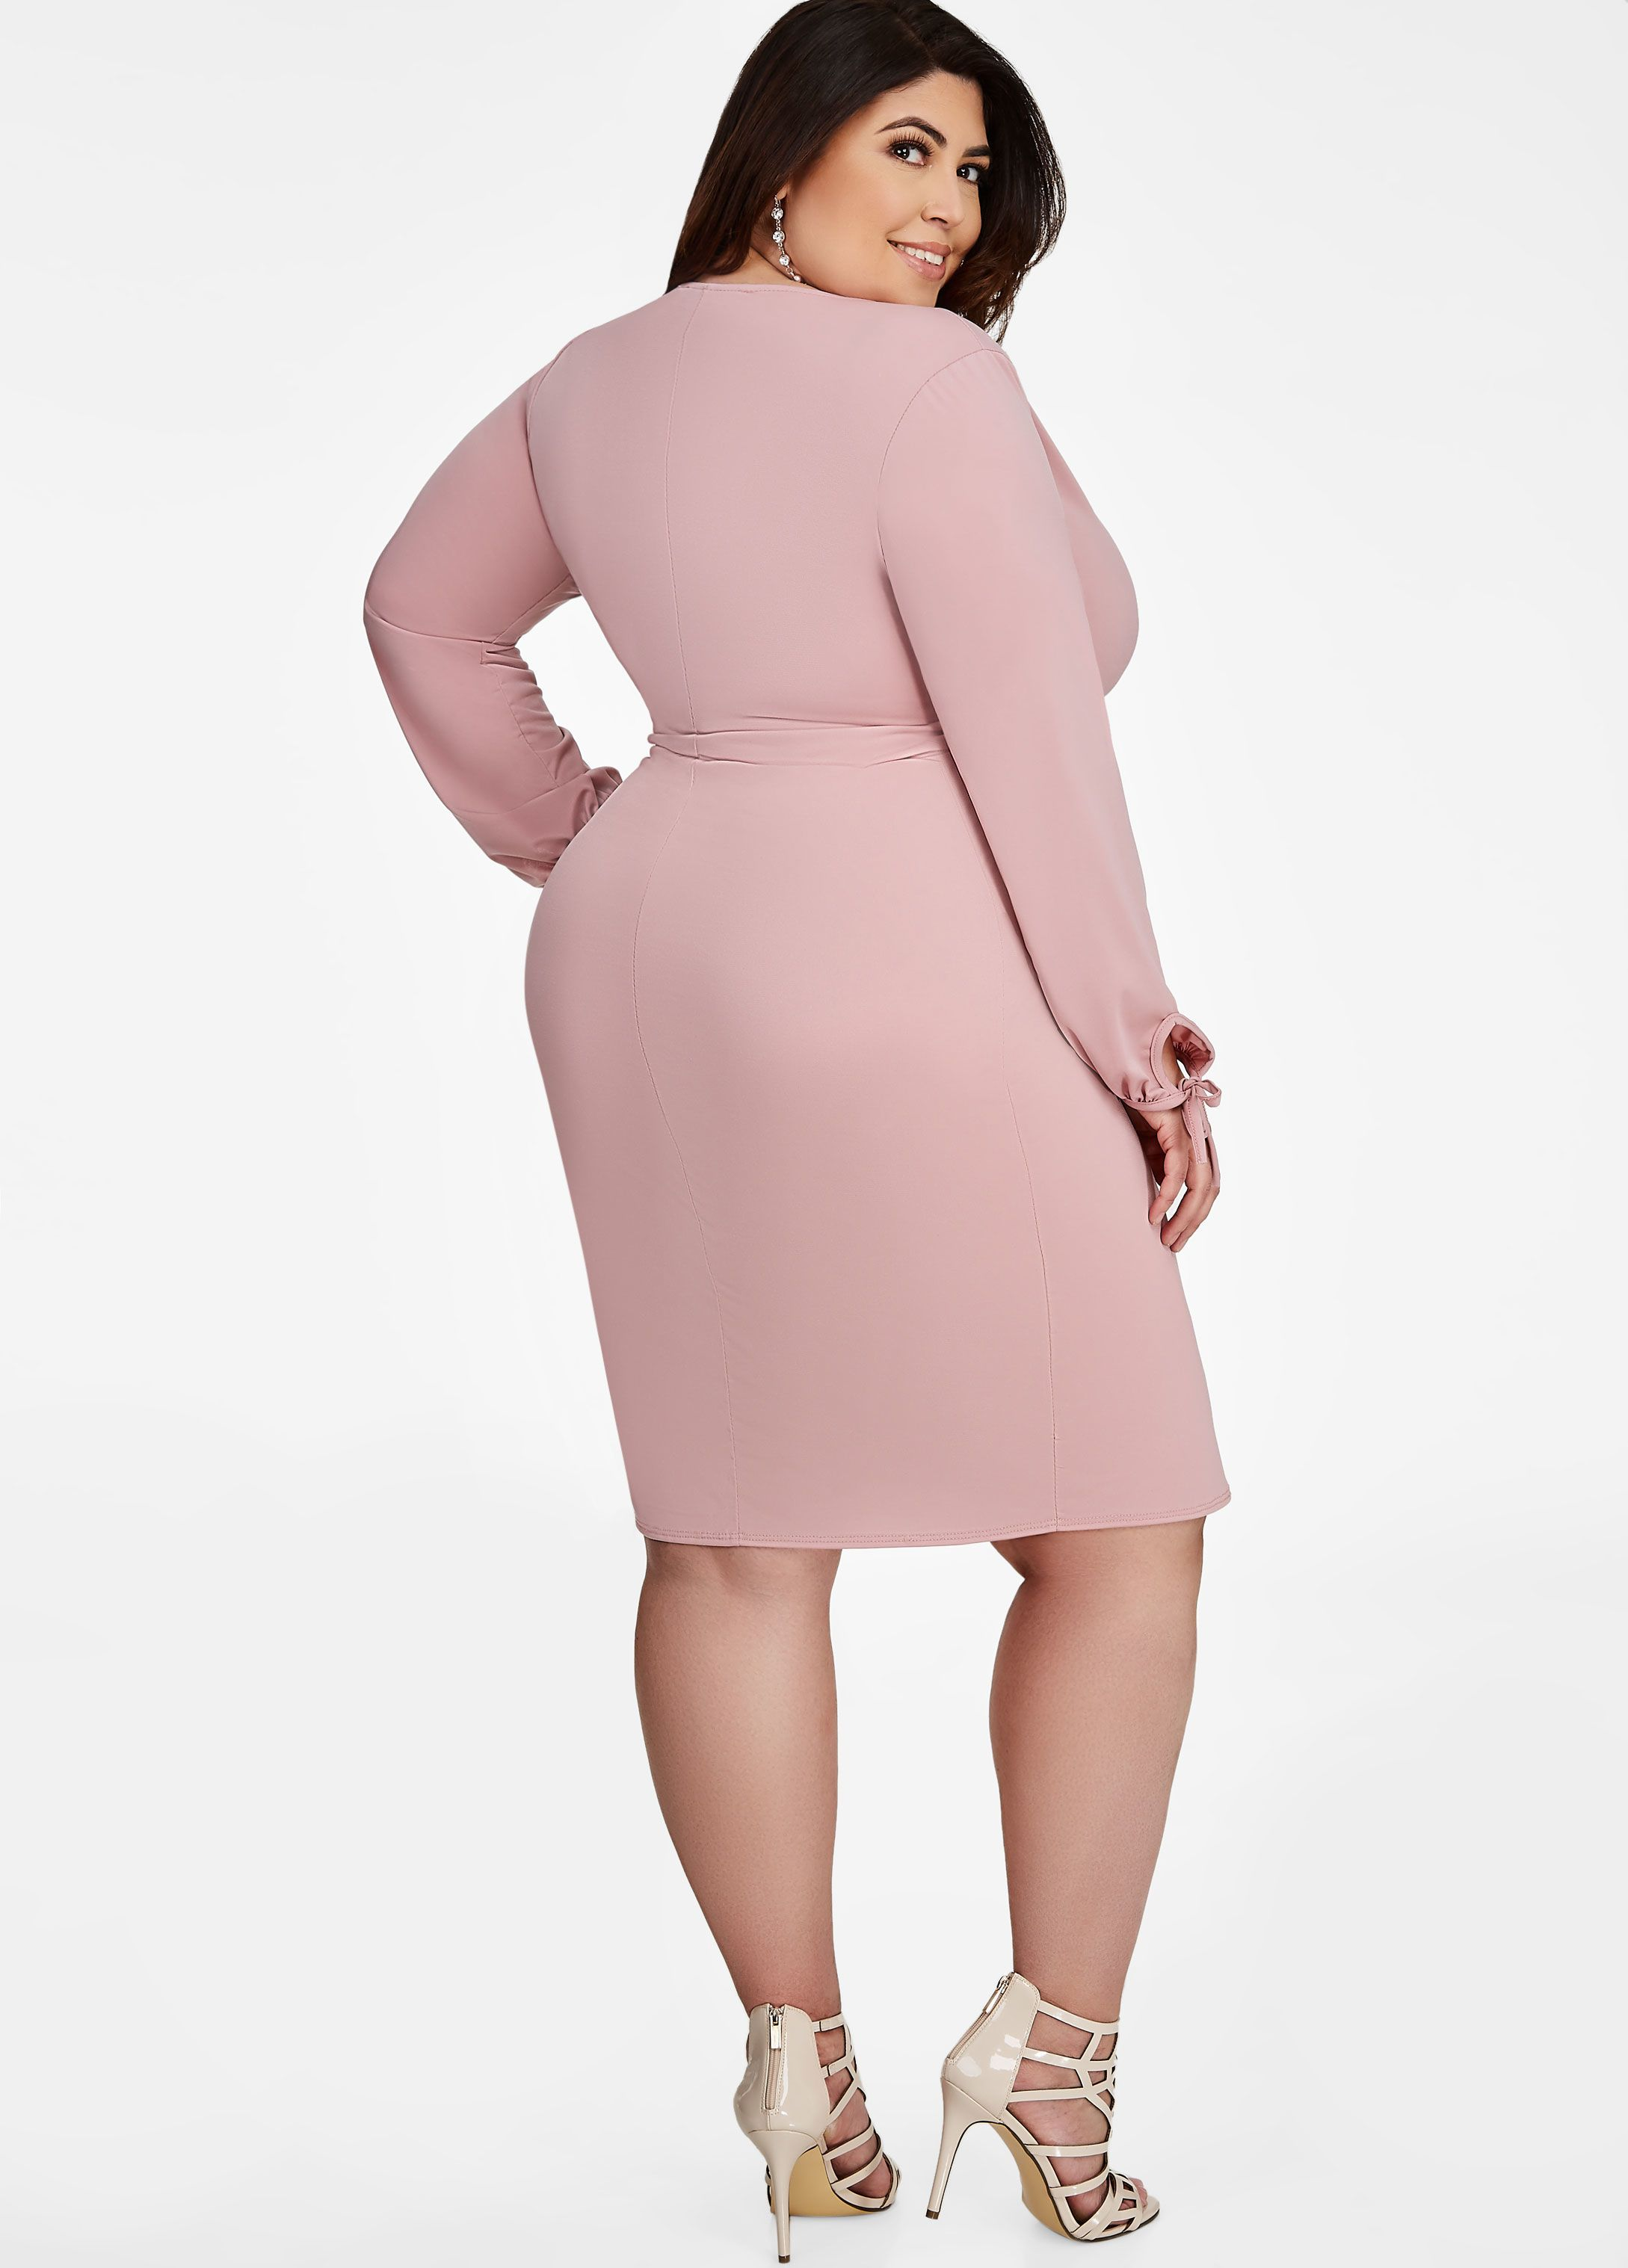 98cc0c4ce27 Tie Sleeve Surplice Dress - Ashley Stewart